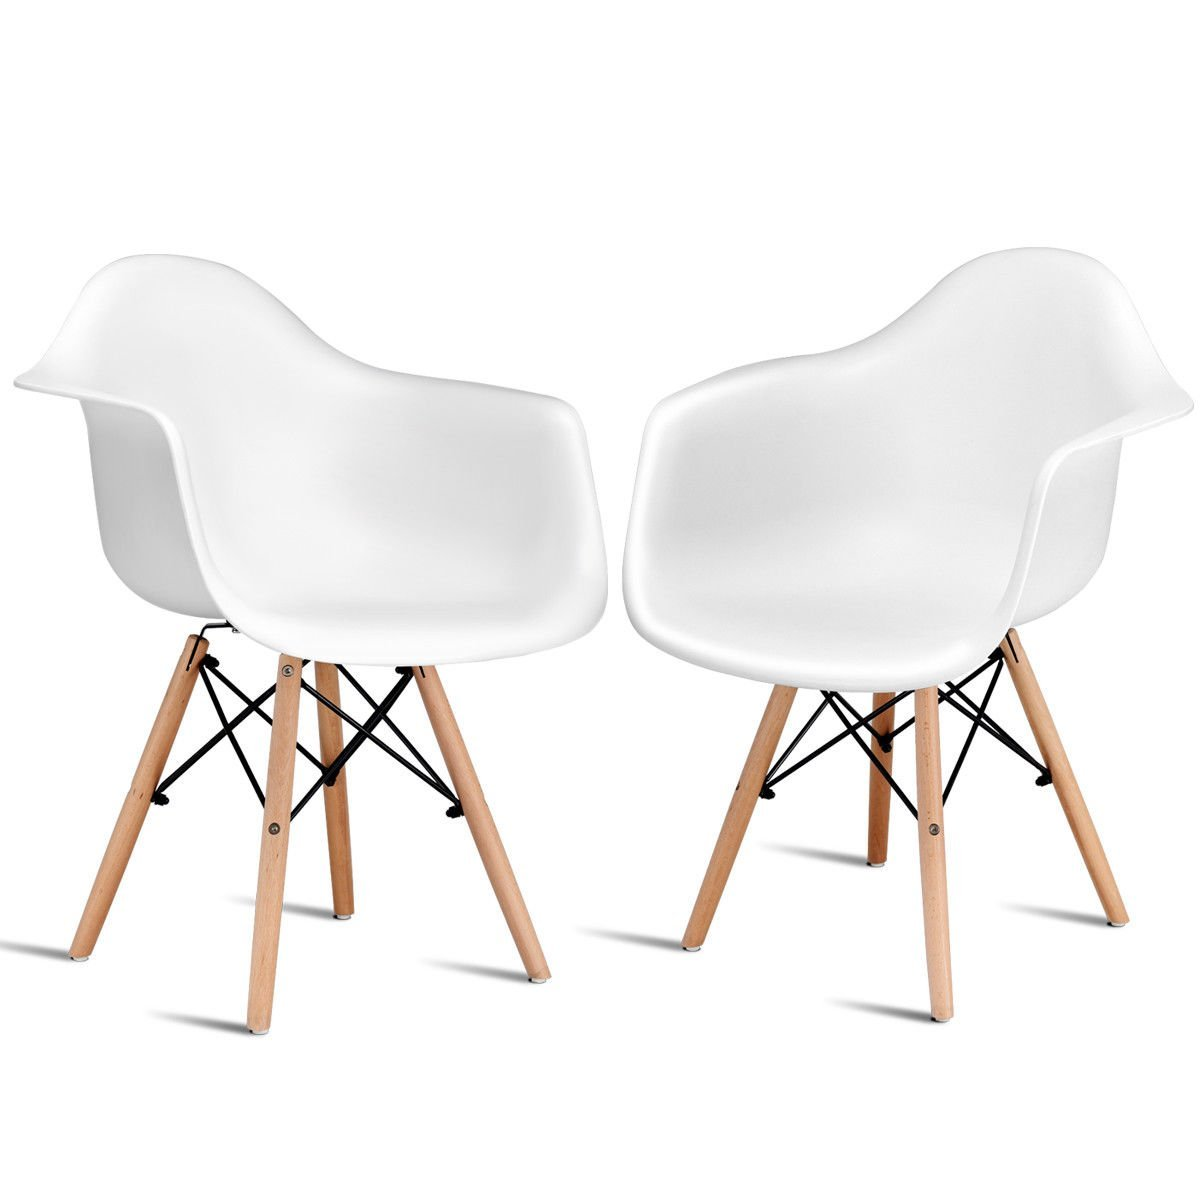 Cheap Mid Century Modern Chair Legs Find Mid Century Modern Chair